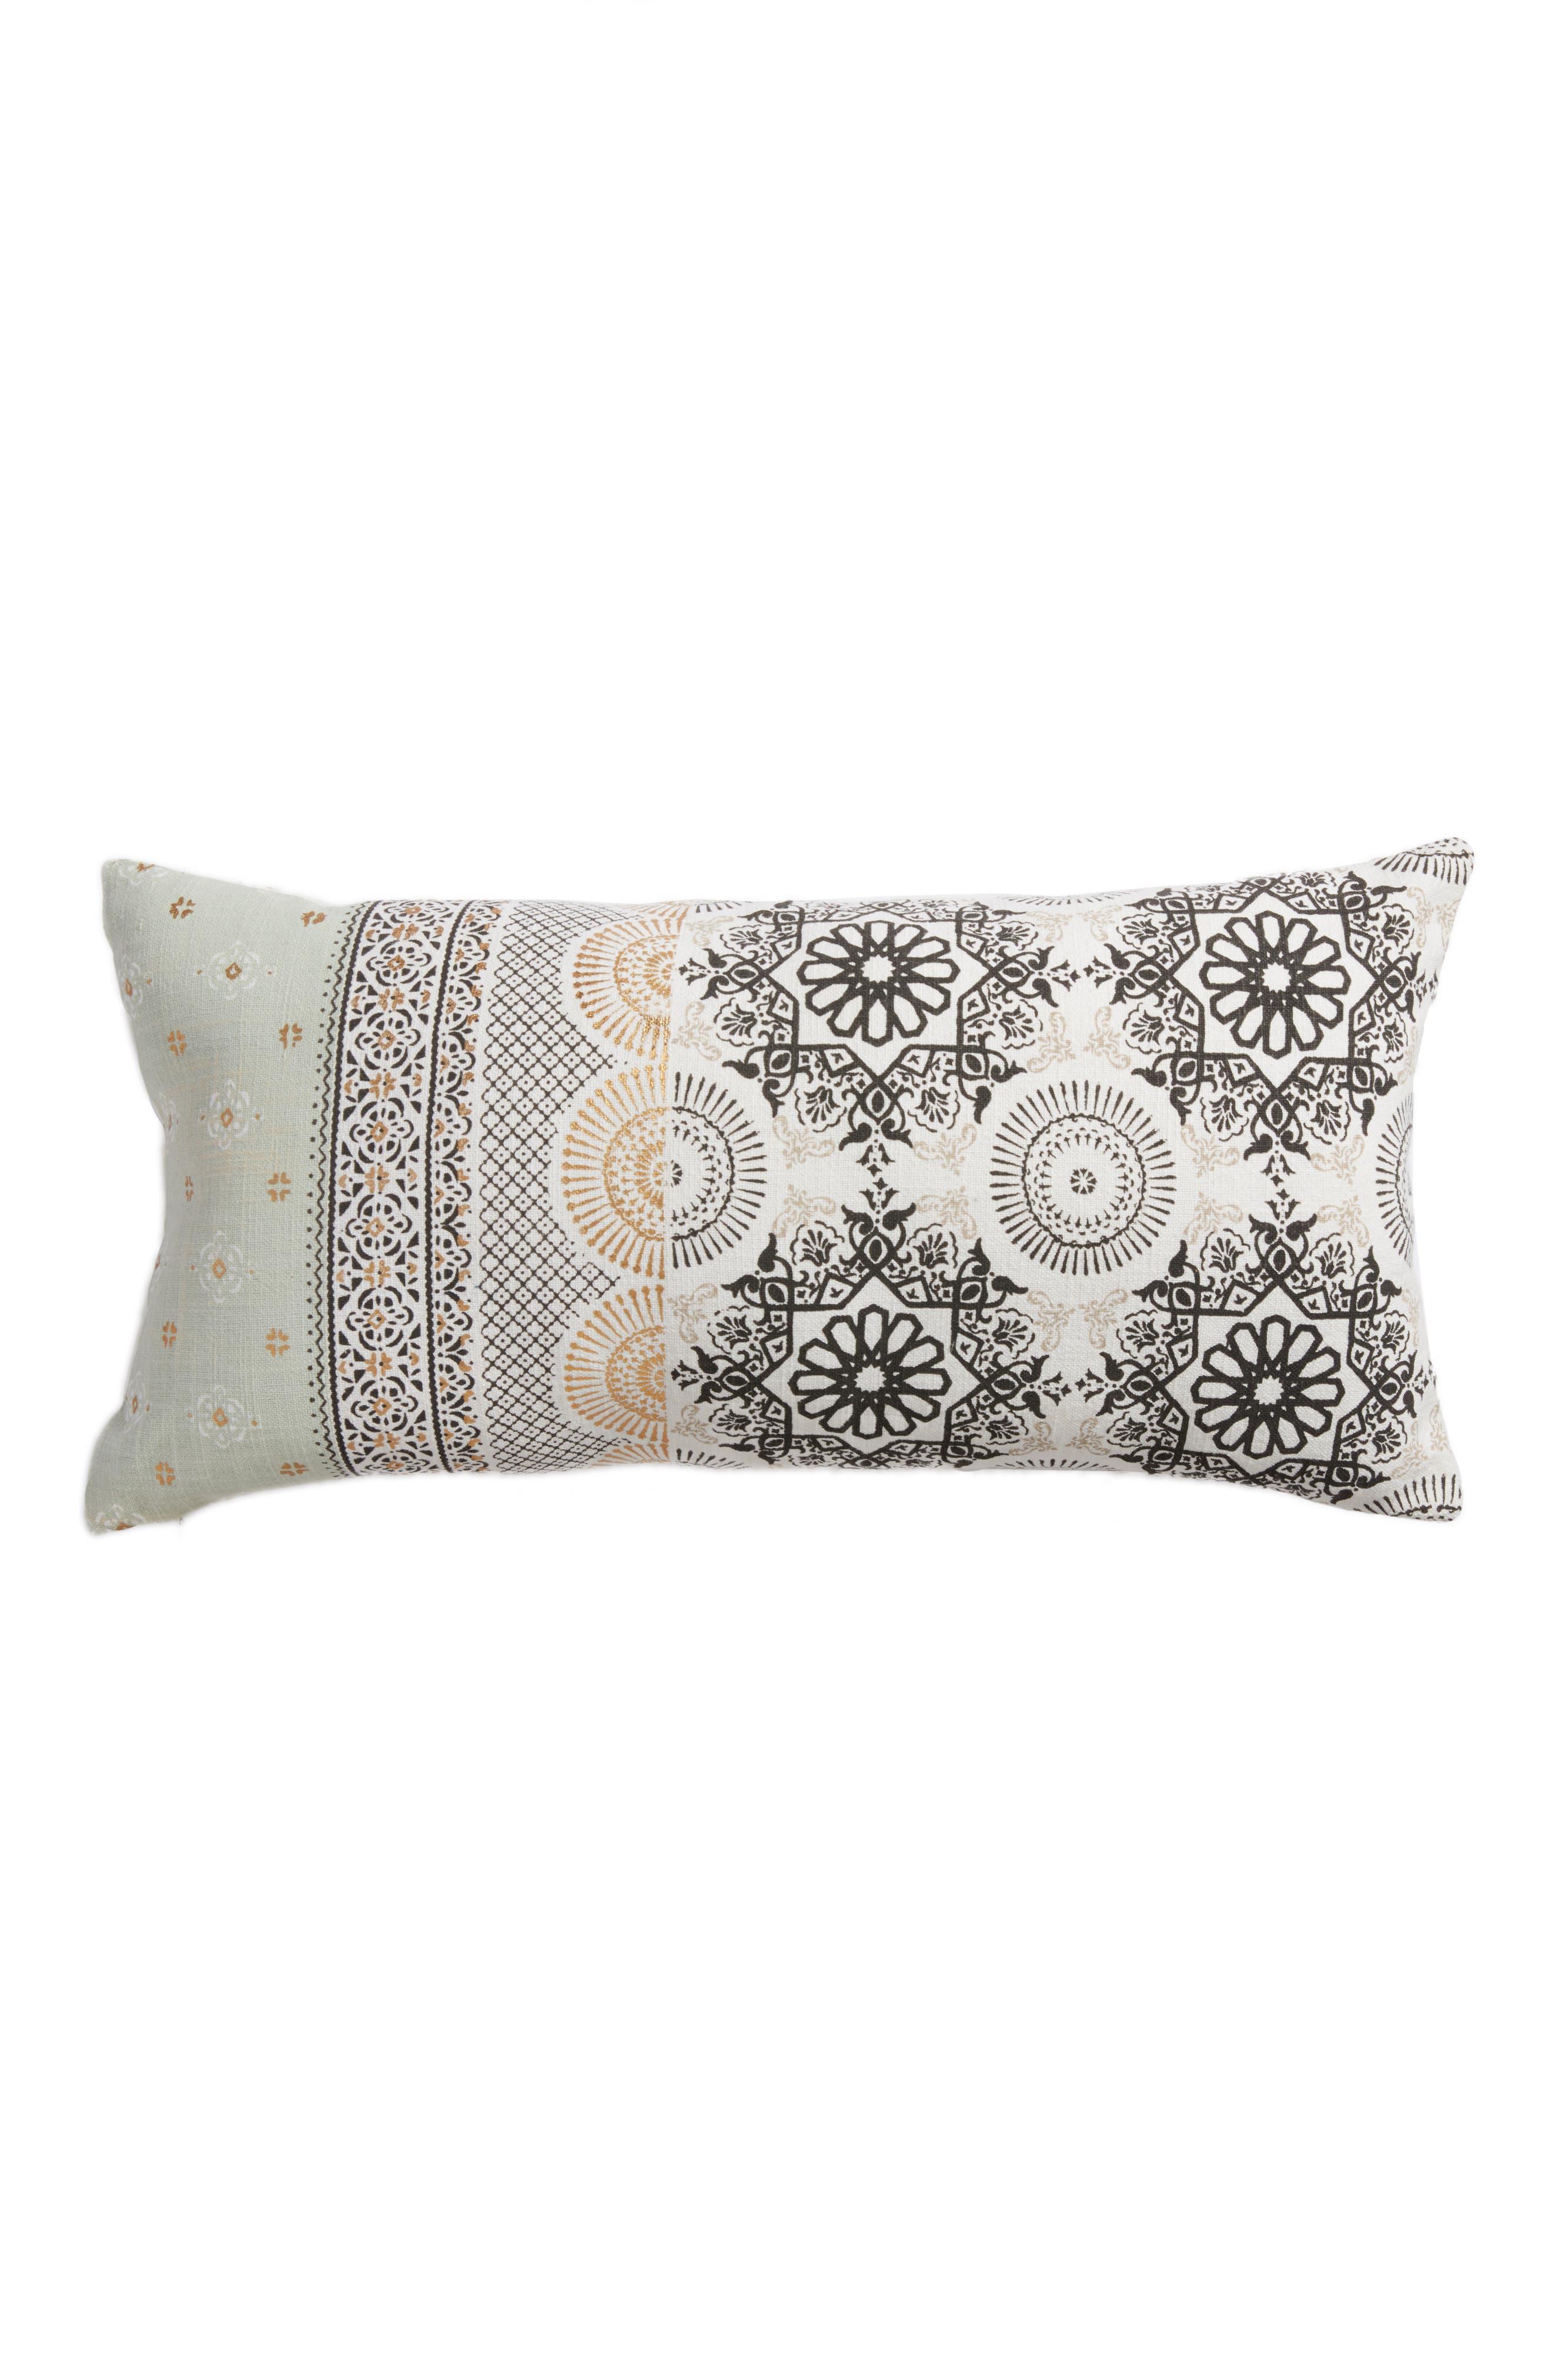 Moroccan Print Accent Pillow,                             Main thumbnail 2, color,